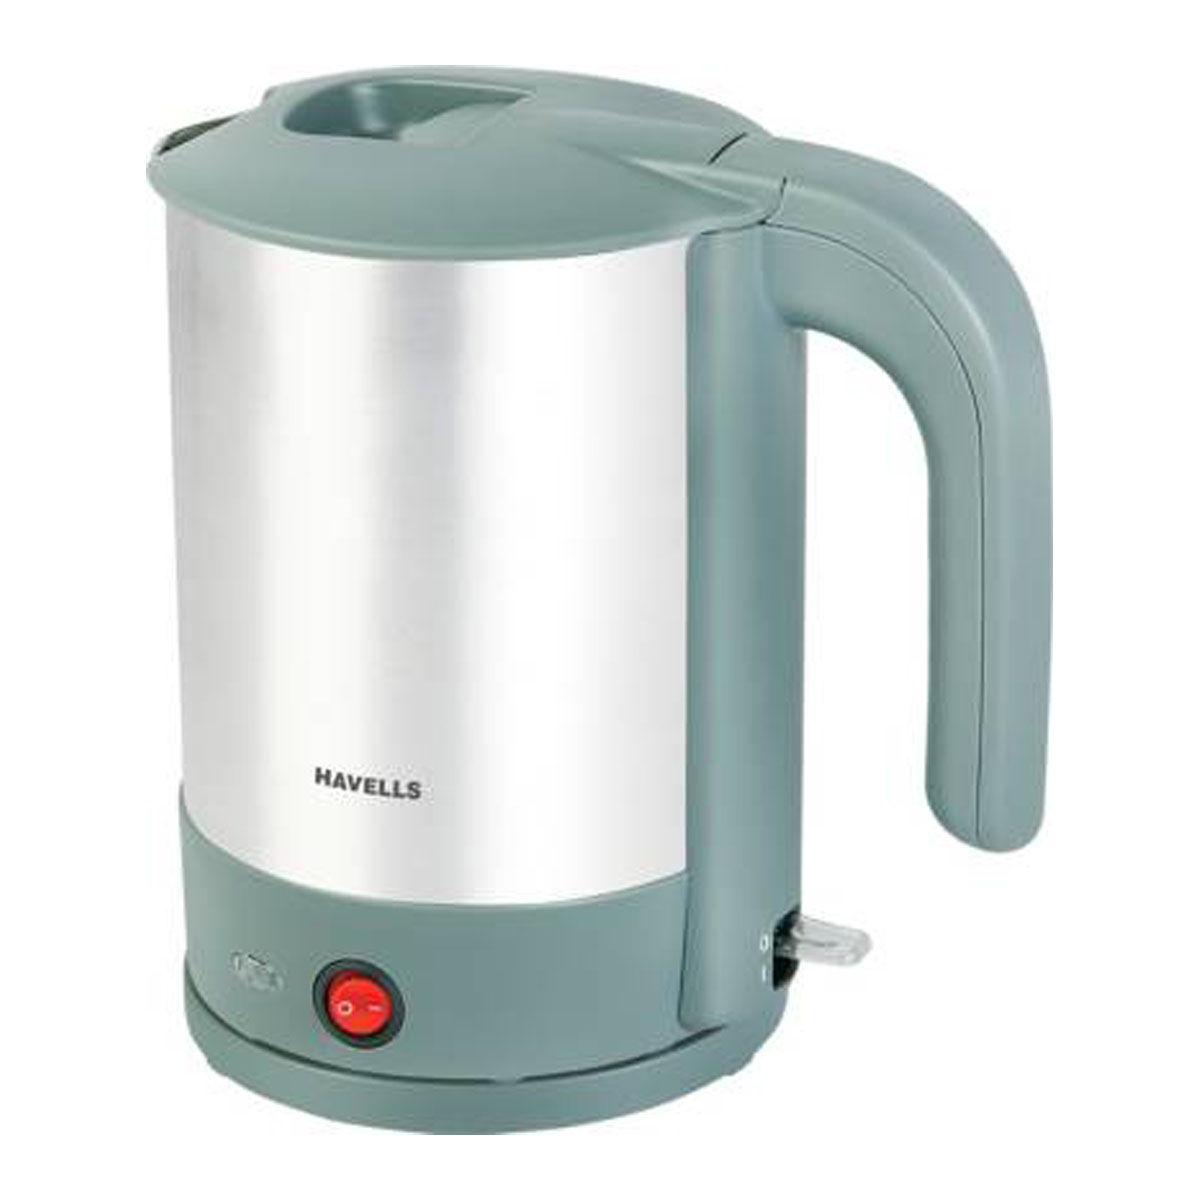 Havells Estelo Personal Coffee Maker